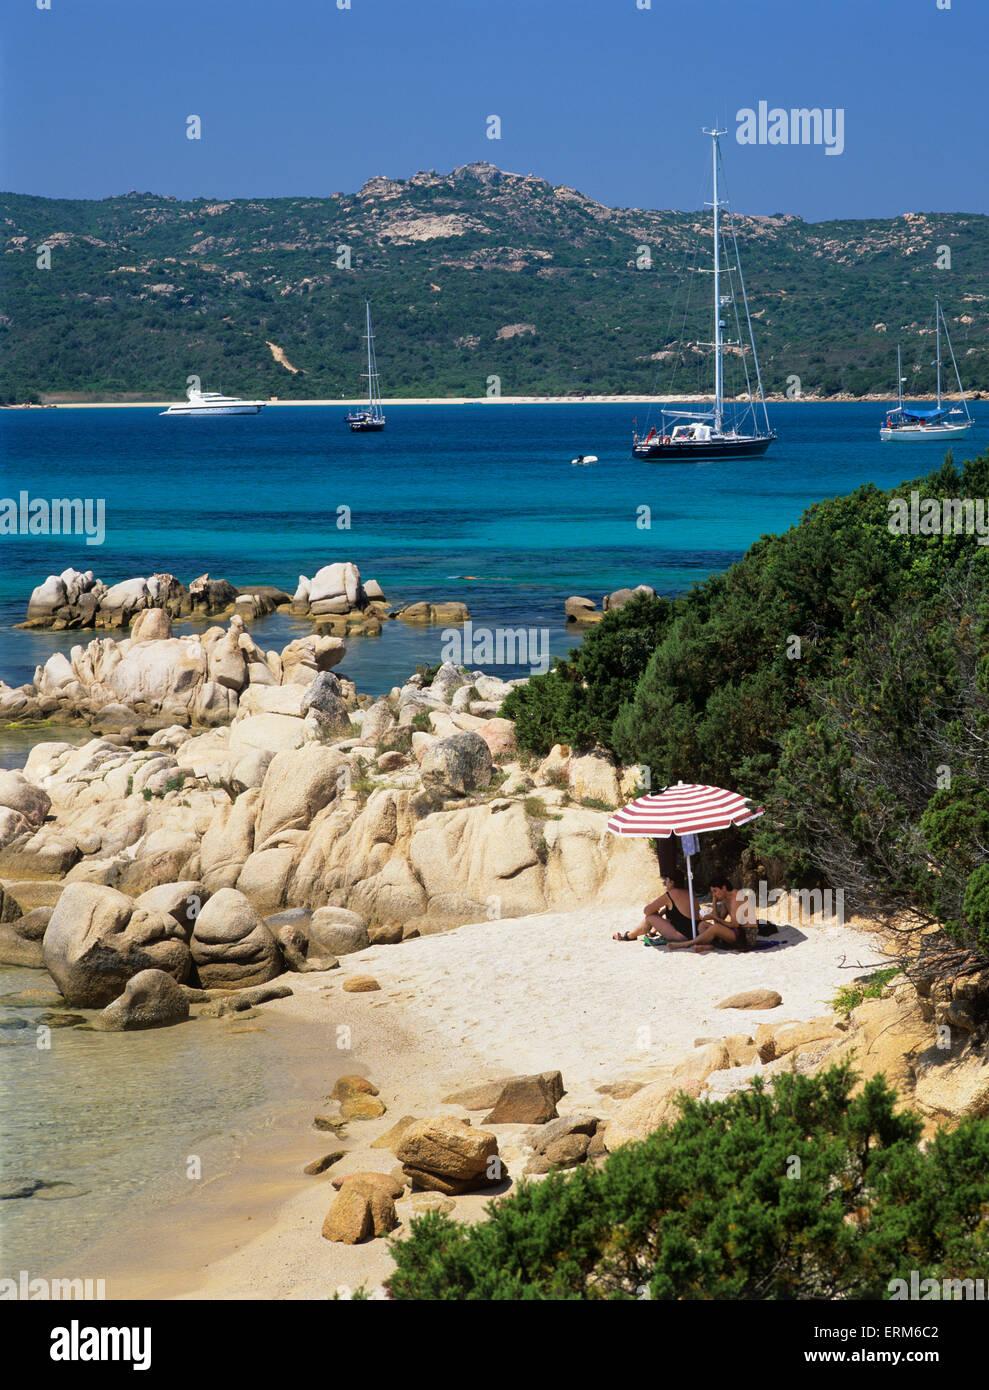 Beach view, Capo Capaccia, Costa Smeralda, Olbia-Tempio Province, Sardinia, Italy, Europe - Stock Image